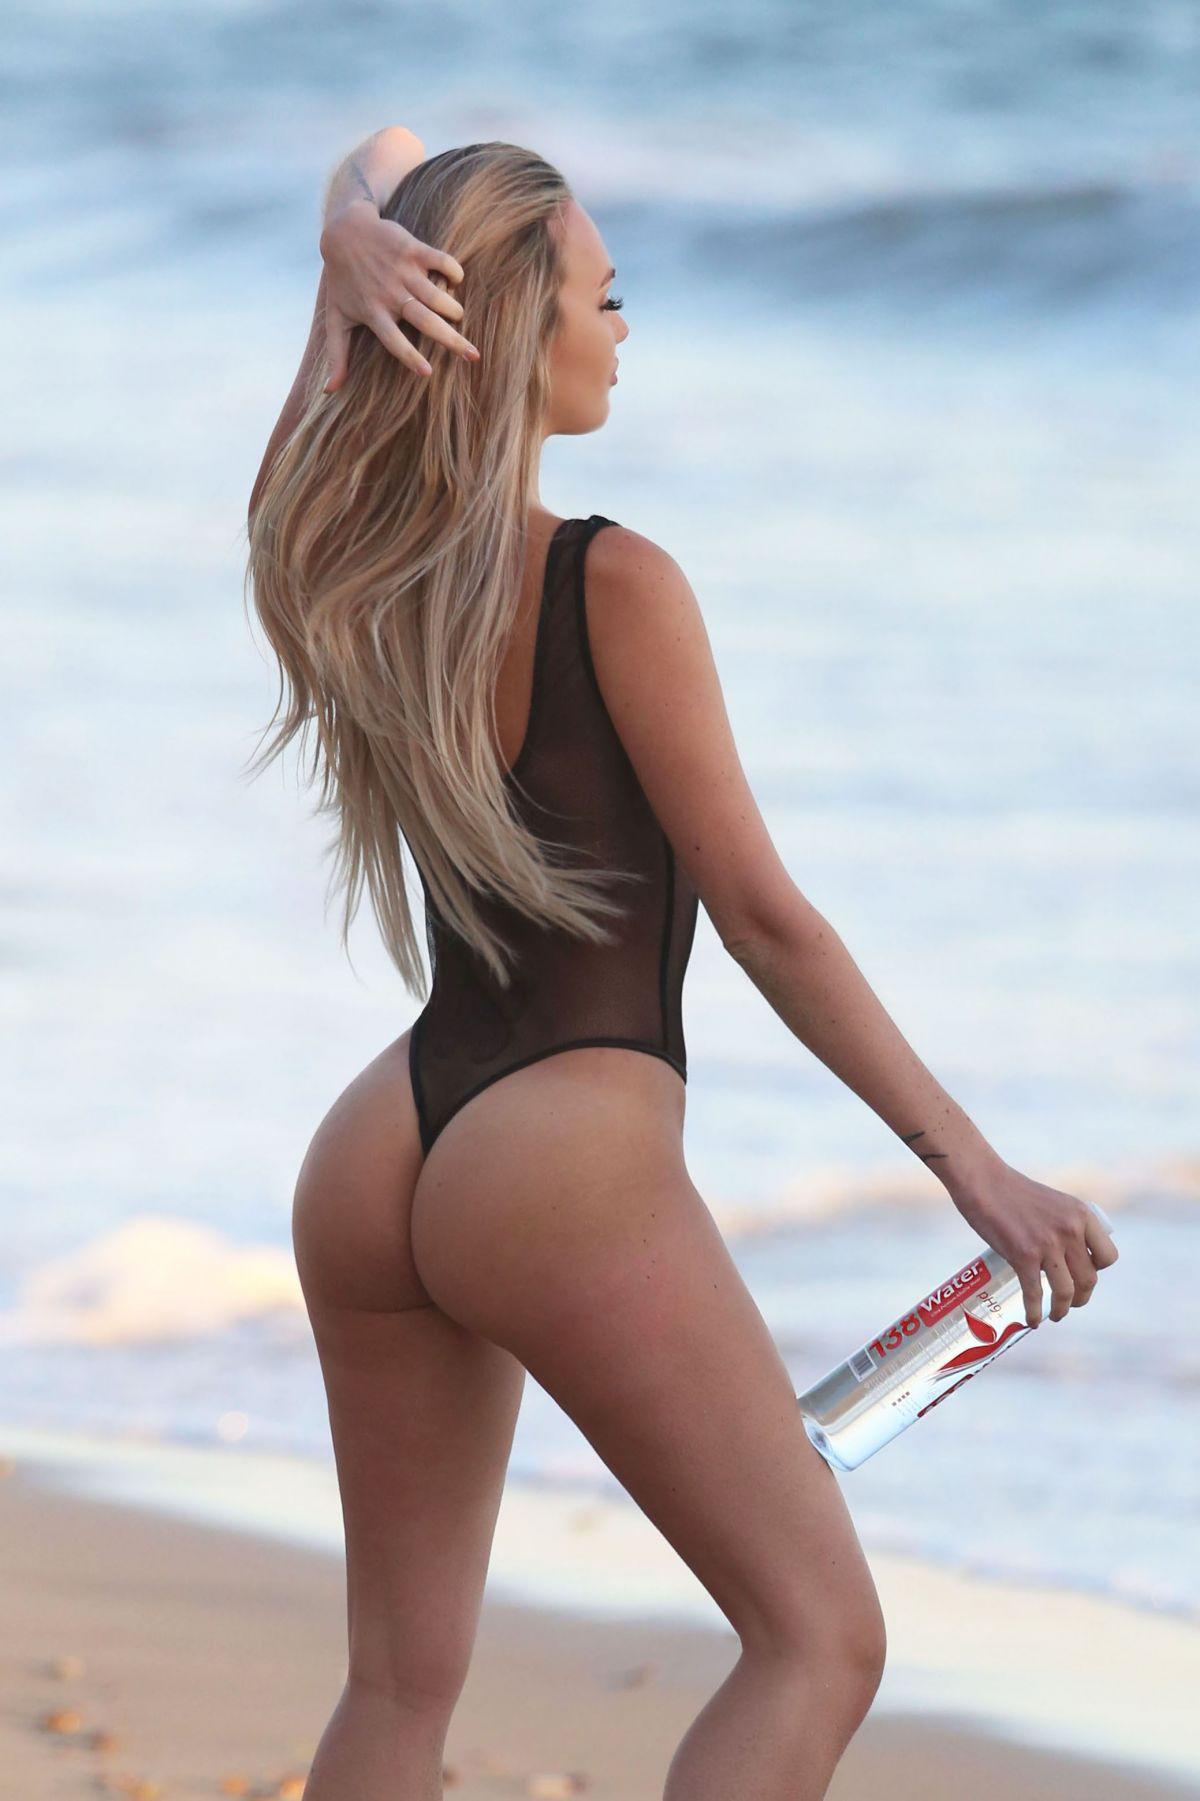 Jules Liesl naked (73 photo), foto Boobs, iCloud, in bikini 2017